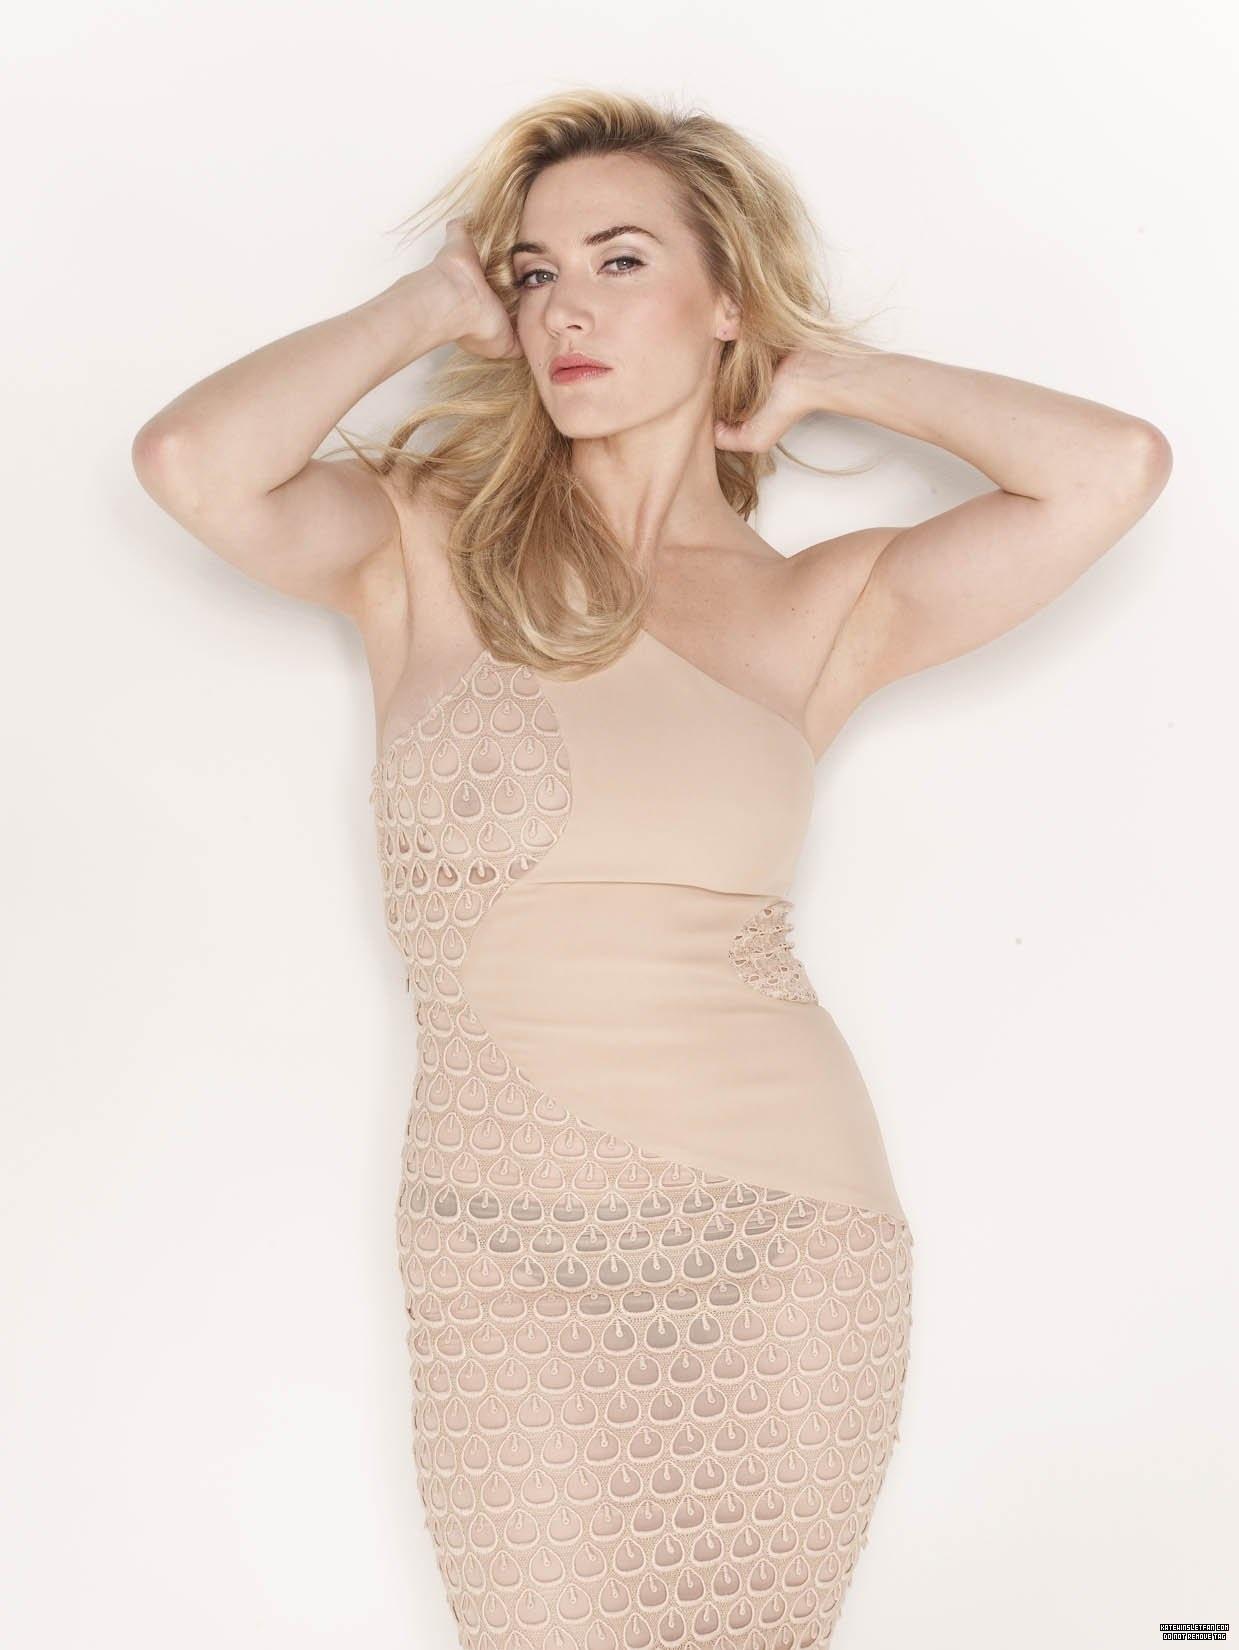 Kate Winslet hot photos Кейт Уинслет красивые фото